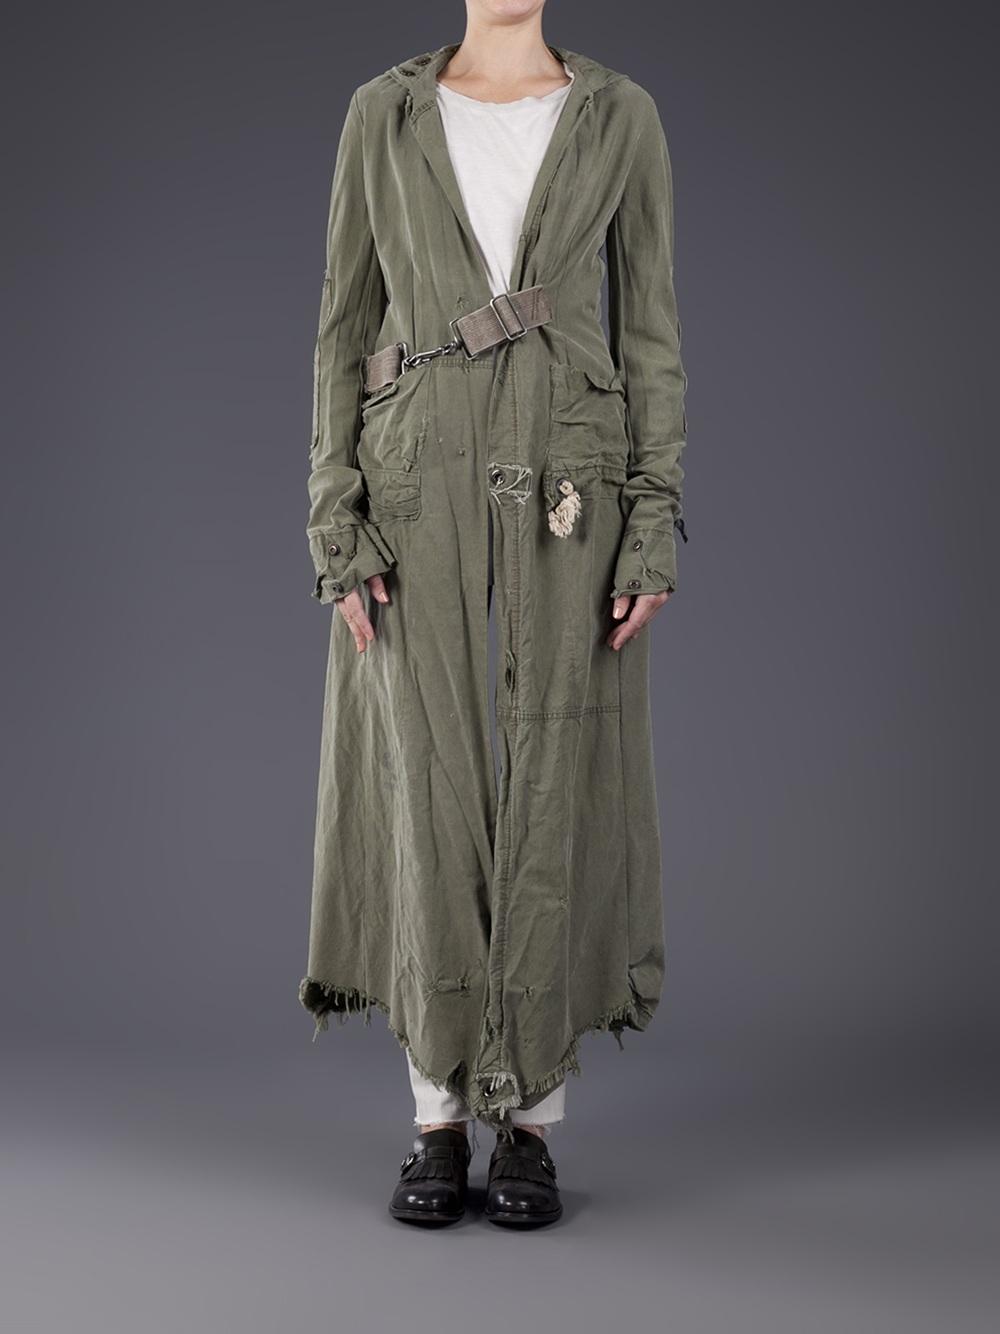 Gallery & Lyst - Greg lauren Tent Toggle Jacket in Green